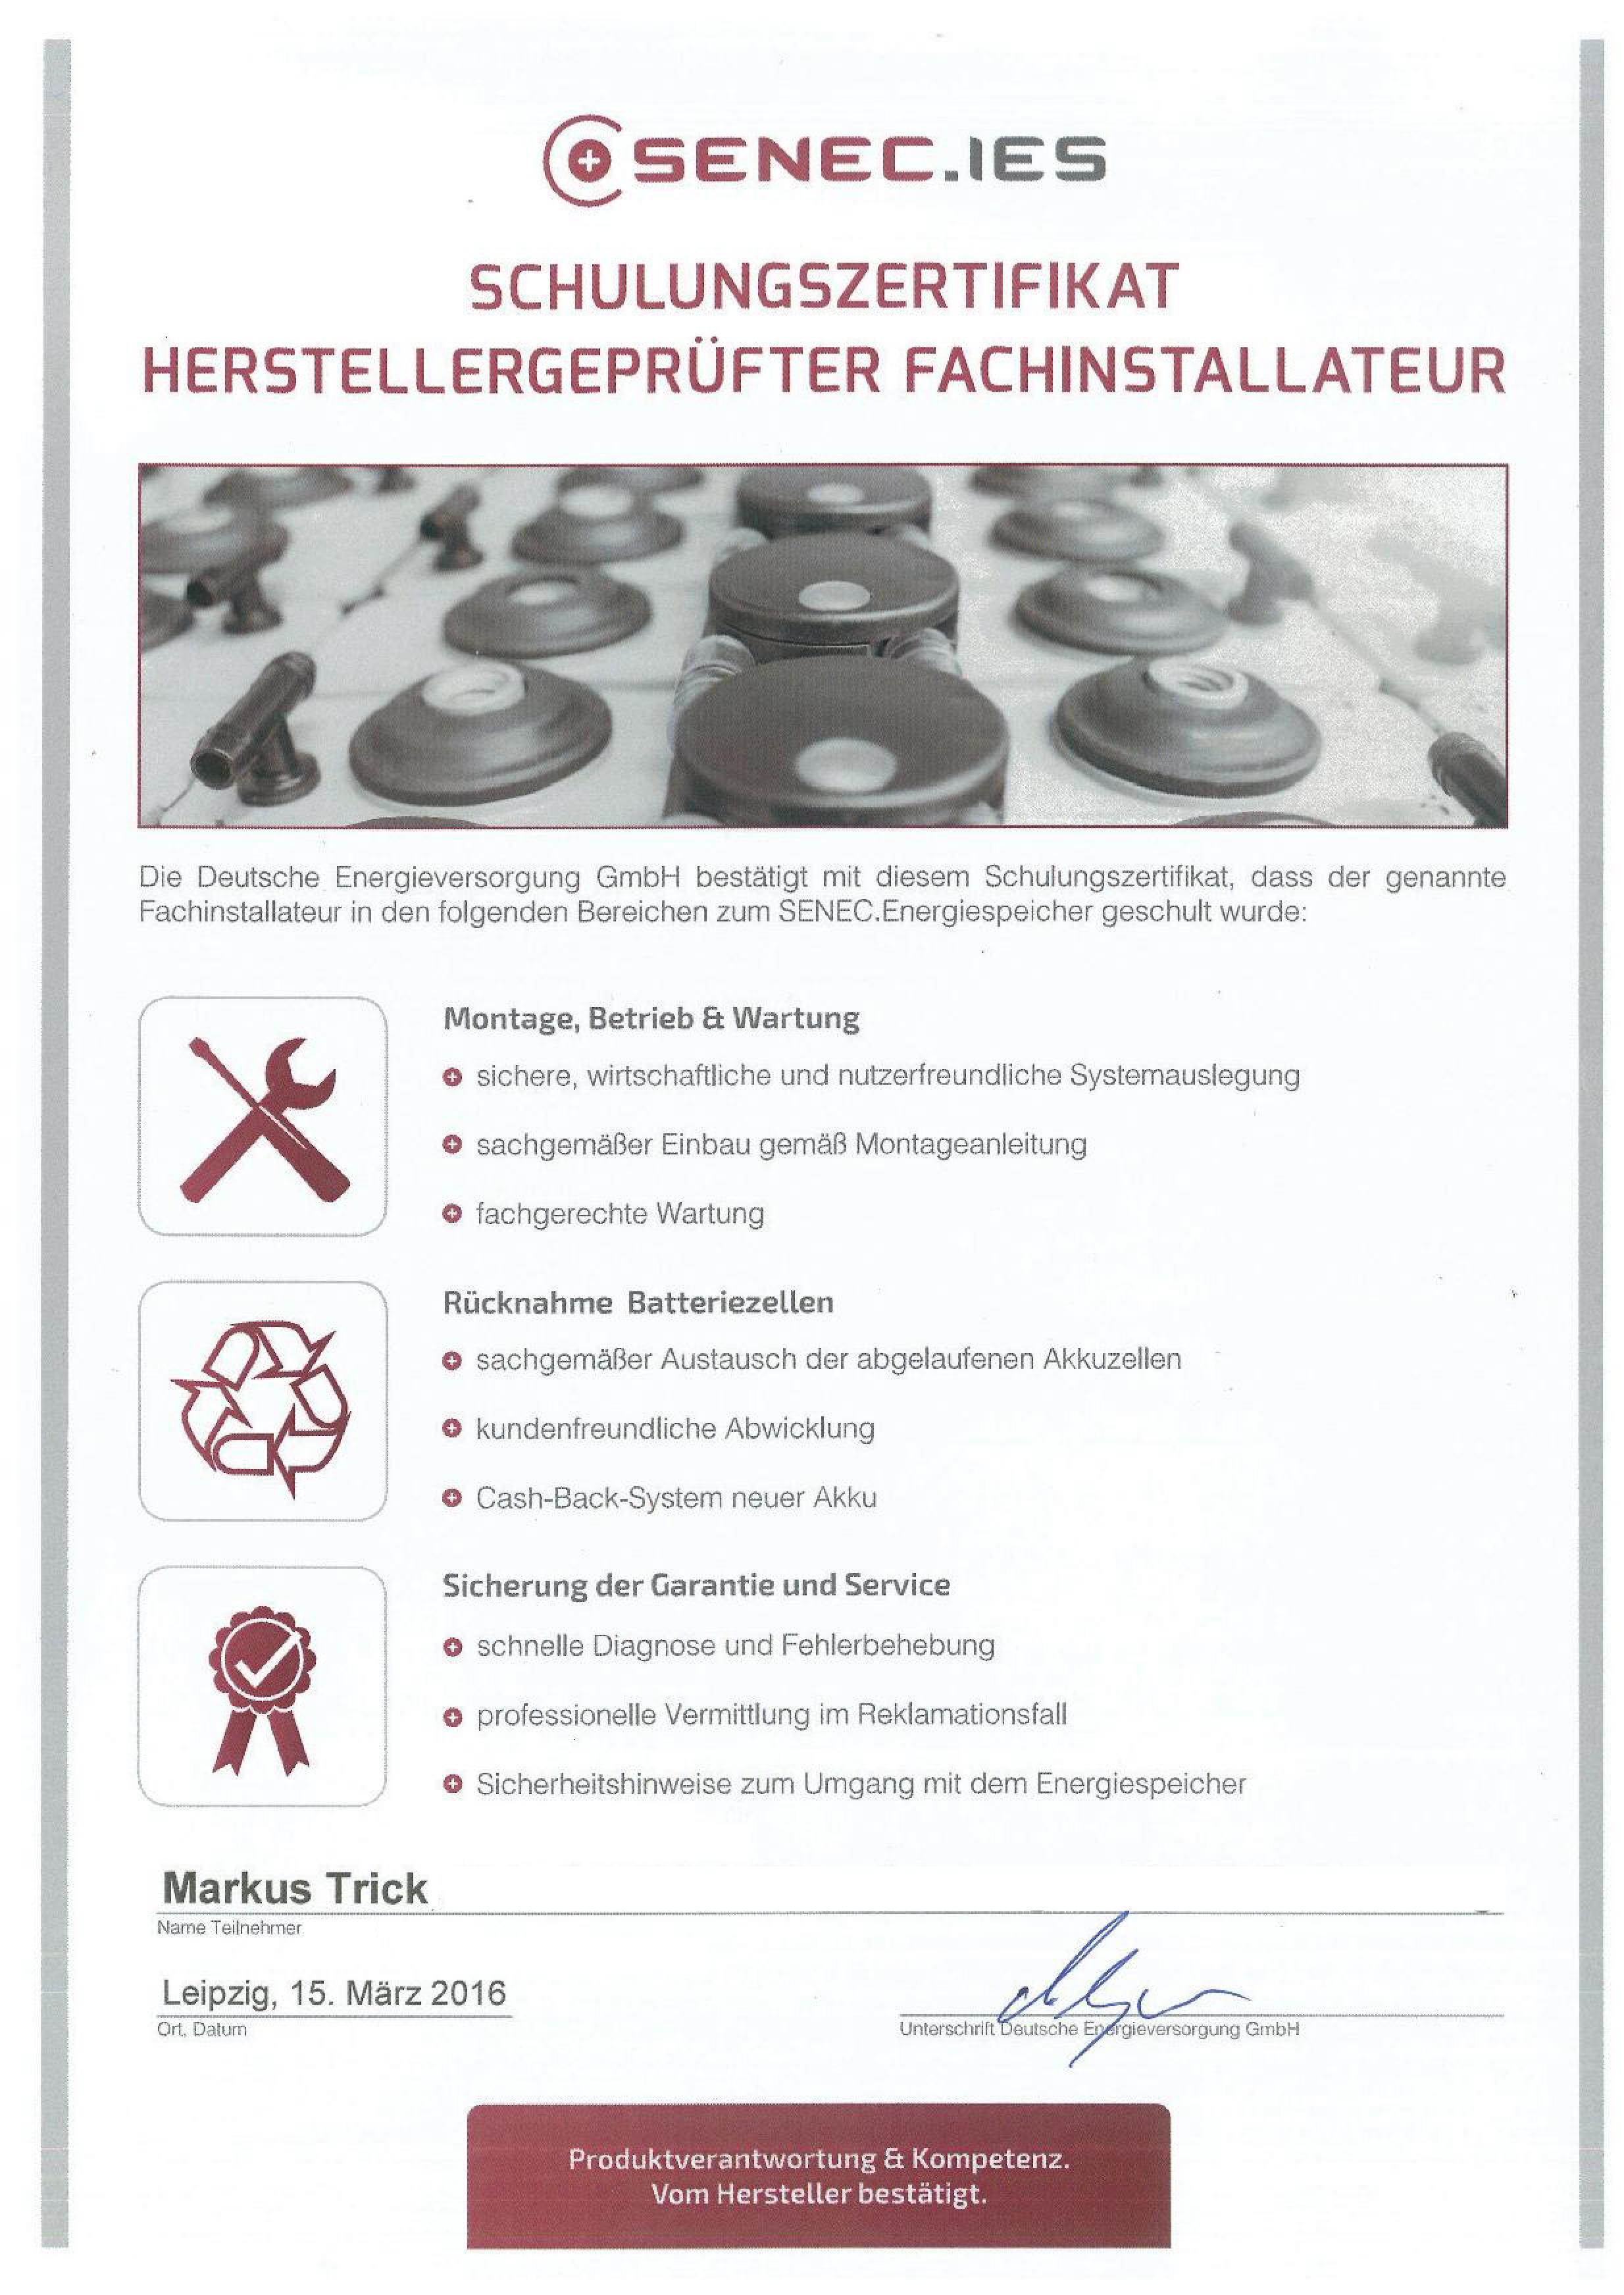 Zertifikat - Herstellergeprüfter Fachinstallateur - SENEC.IES - Markus Trick